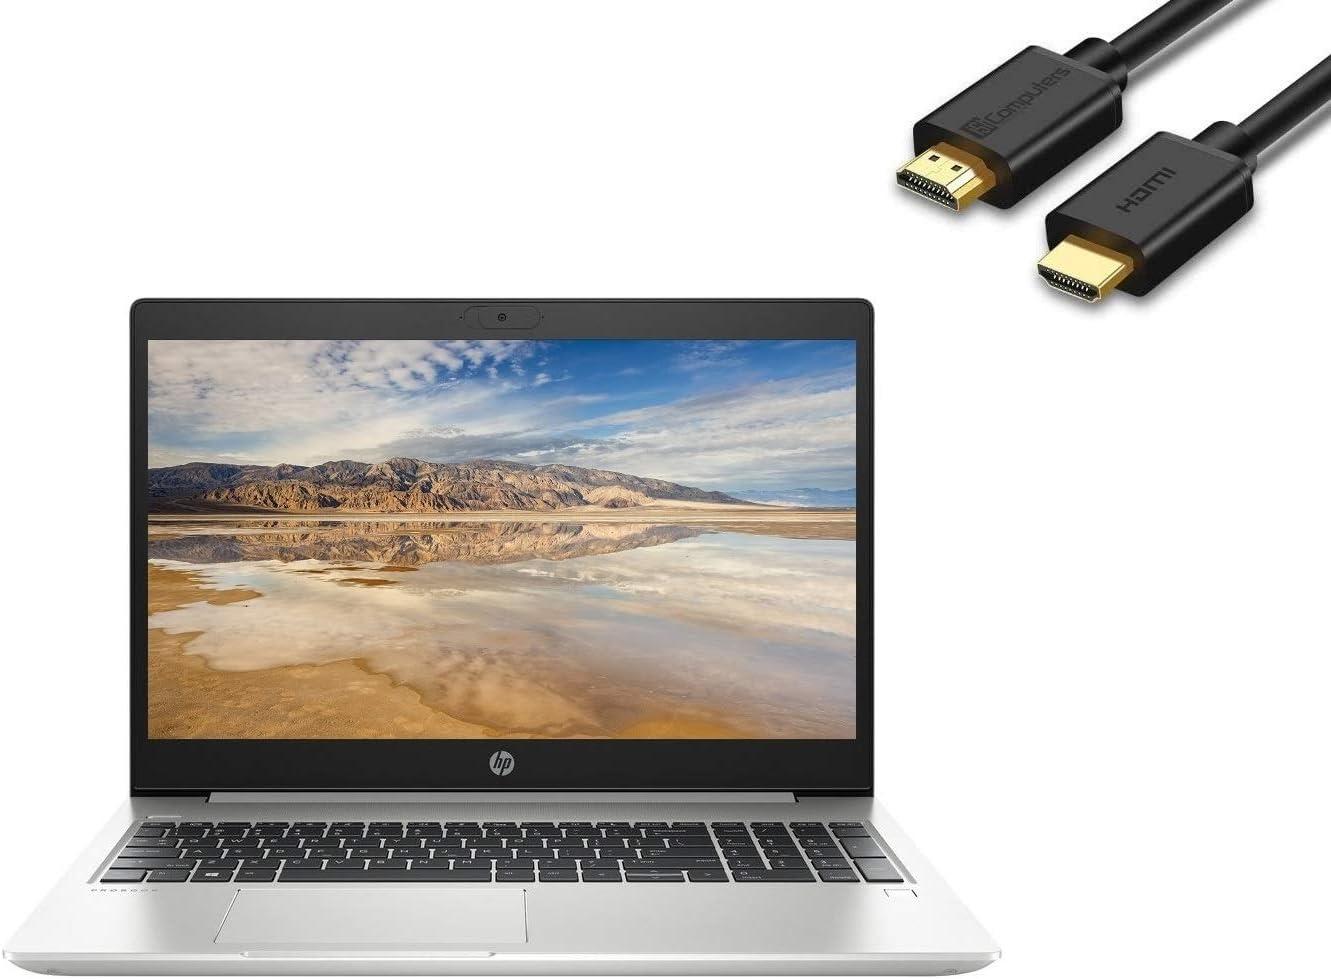 "2020 HP ProBook 450 G7 15.6"" FHD Full HD 1080p Anti-Glare Business Laptop (Intel Quad-Core i5-10210U, 16GB DDR4 RAM, 512GB PCIe SSD) Backlit, Type-C, RJ-45, Webcam, Windows 10 Pro + IST HDMI Cable"